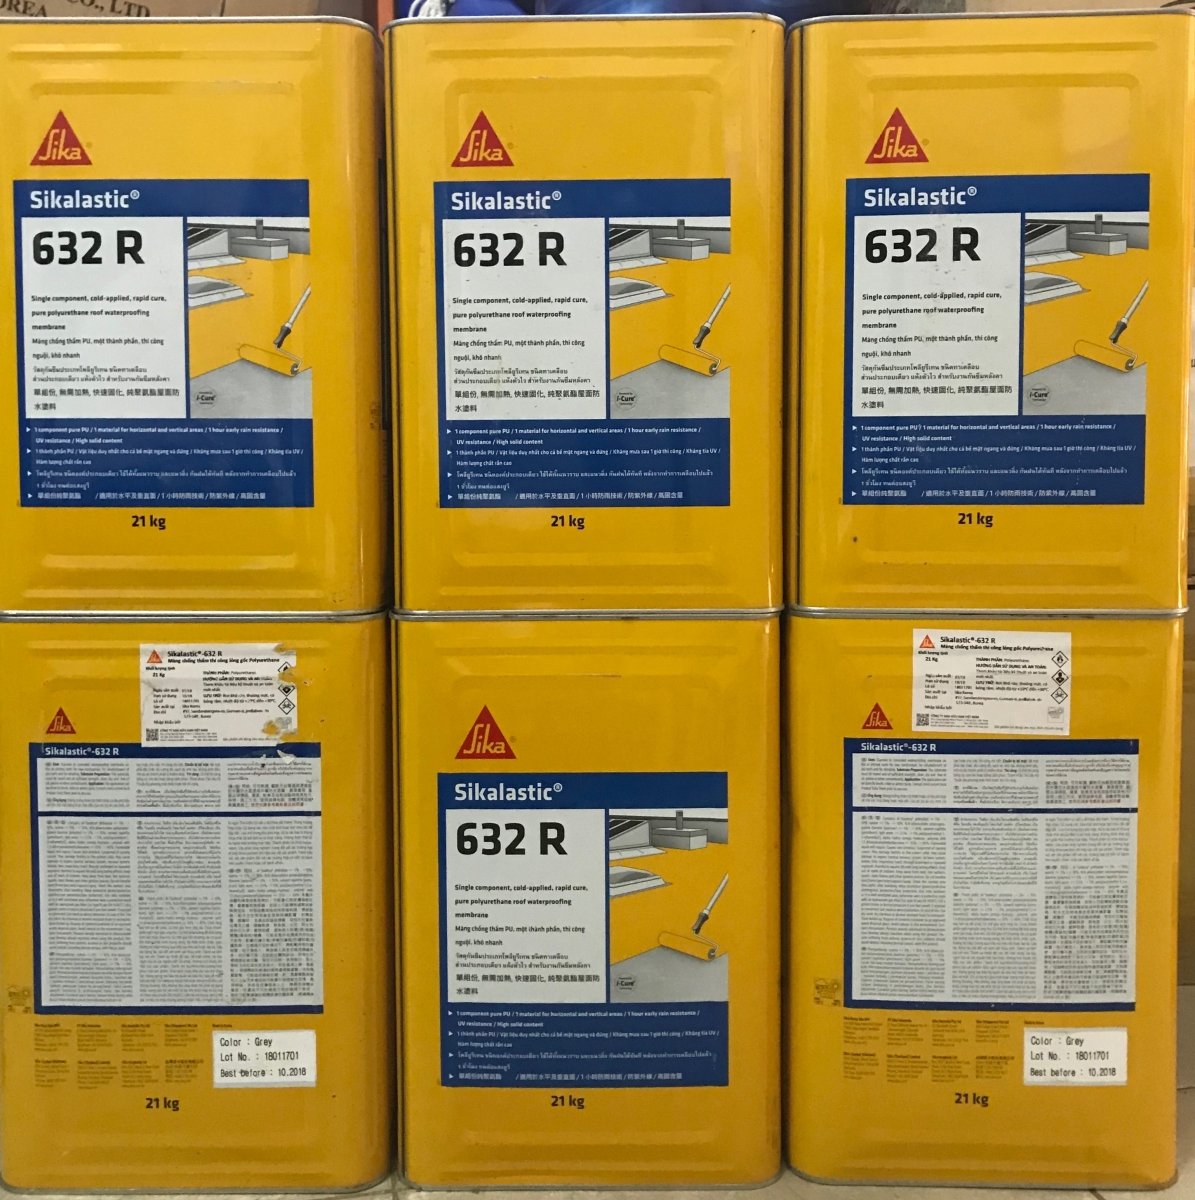 Sikalastic®-632R la Màng chống thấm dạng lỏng gốc Polyurethane , Sikalastic®-632R la Mang chong tham dang long goc Polyurethane